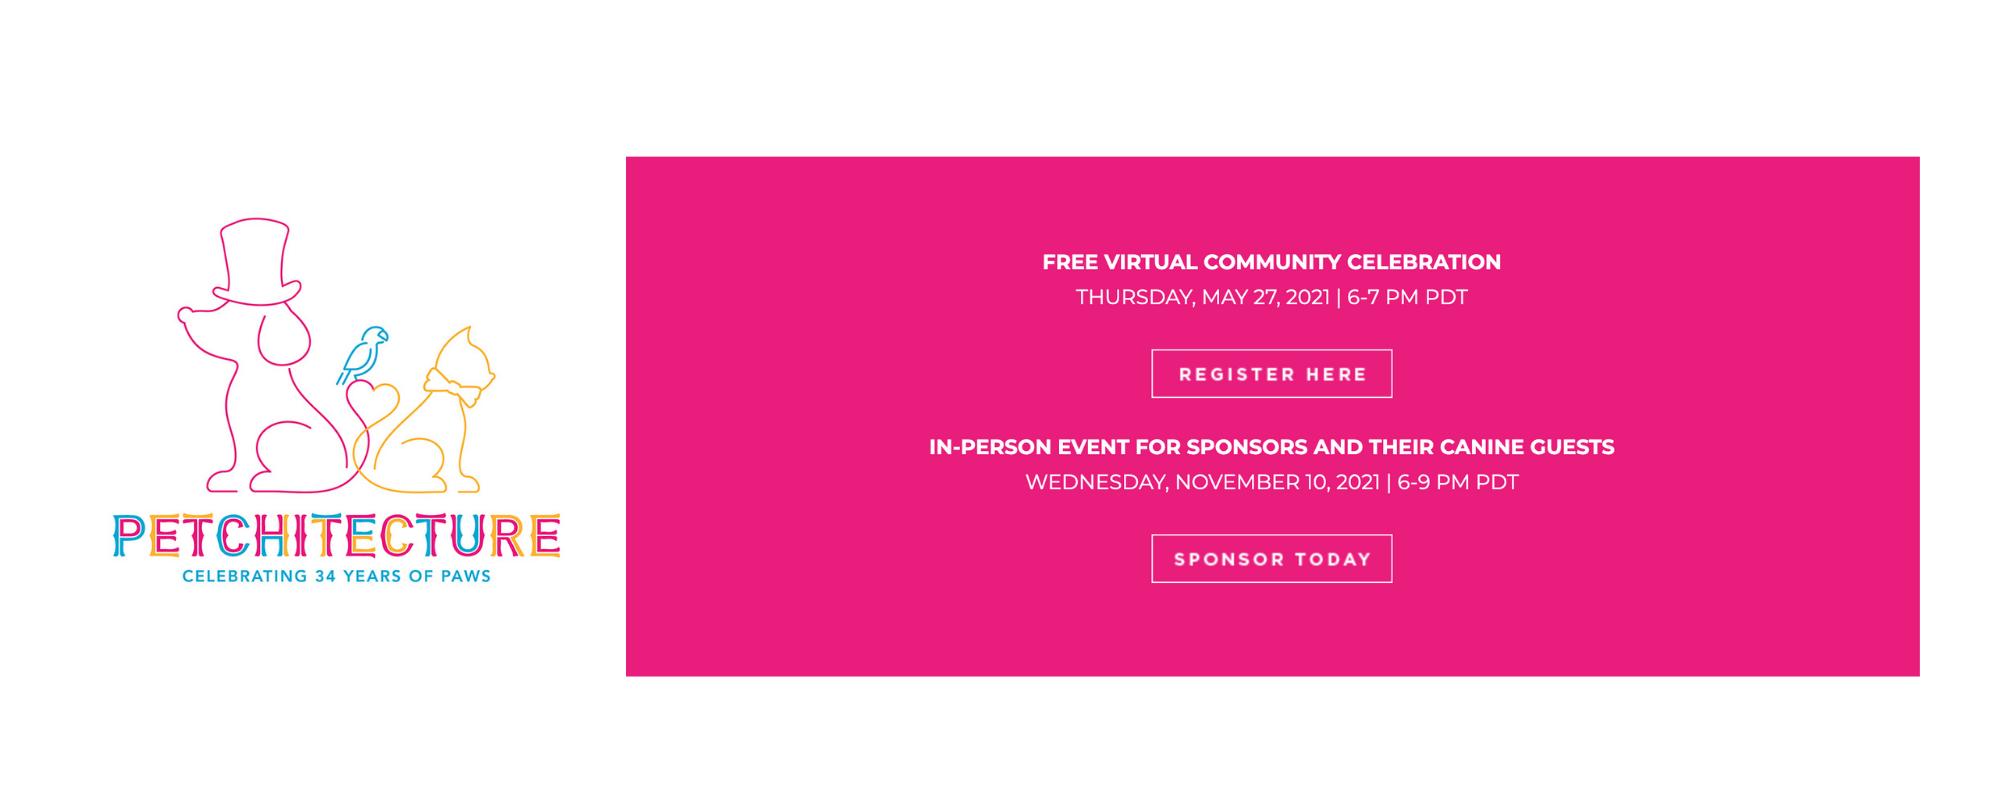 Petchitecture logo. Free Virtual Community Celebration